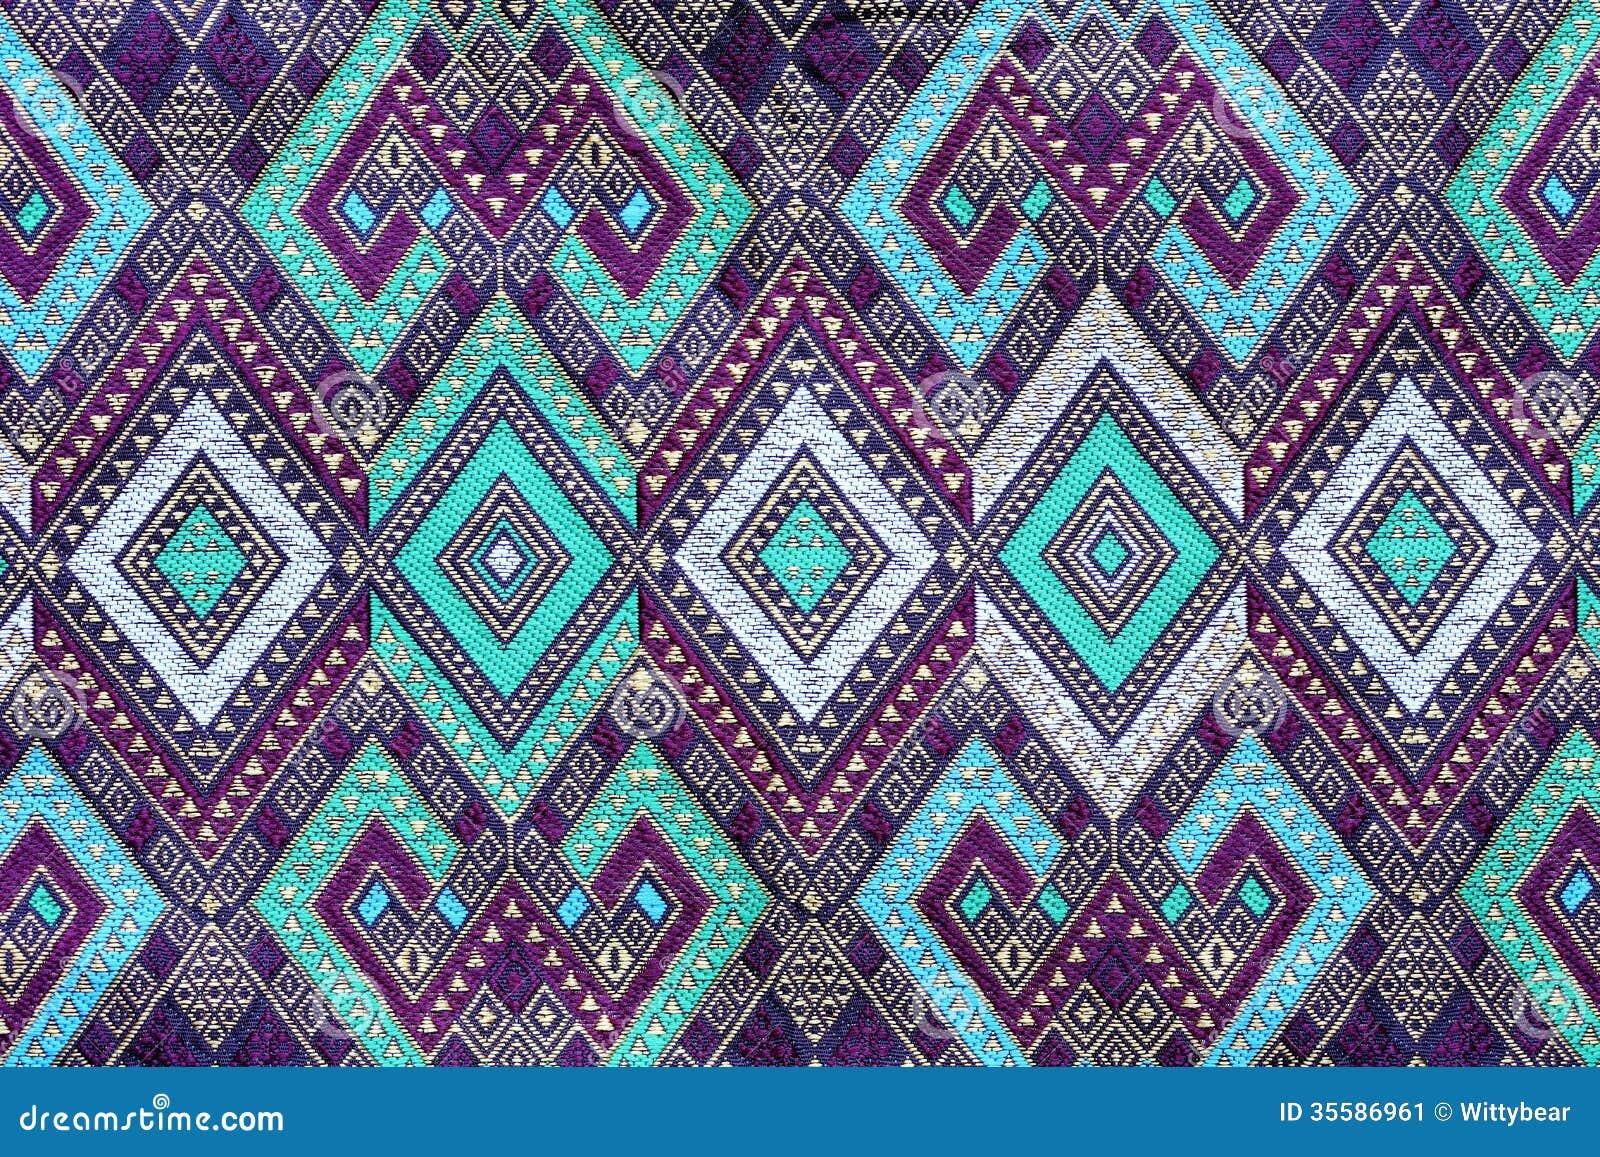 Batik Cloth Fabric Texture Background Stock Image